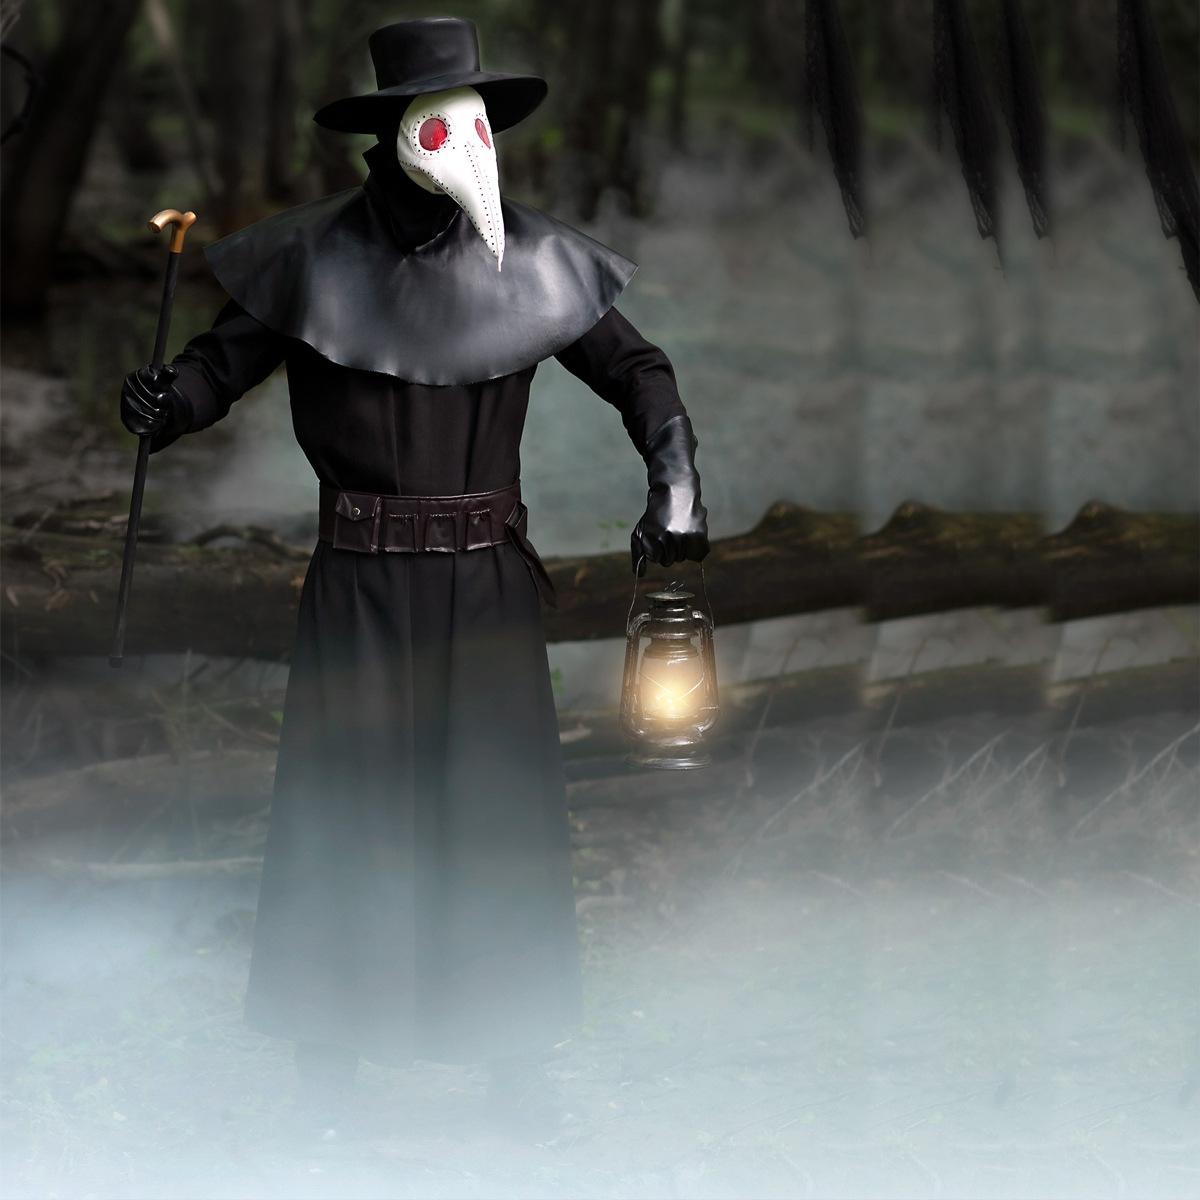 Halloween Cosplay plague beak doctor costume dark hero costume Venice carnival dress up 0